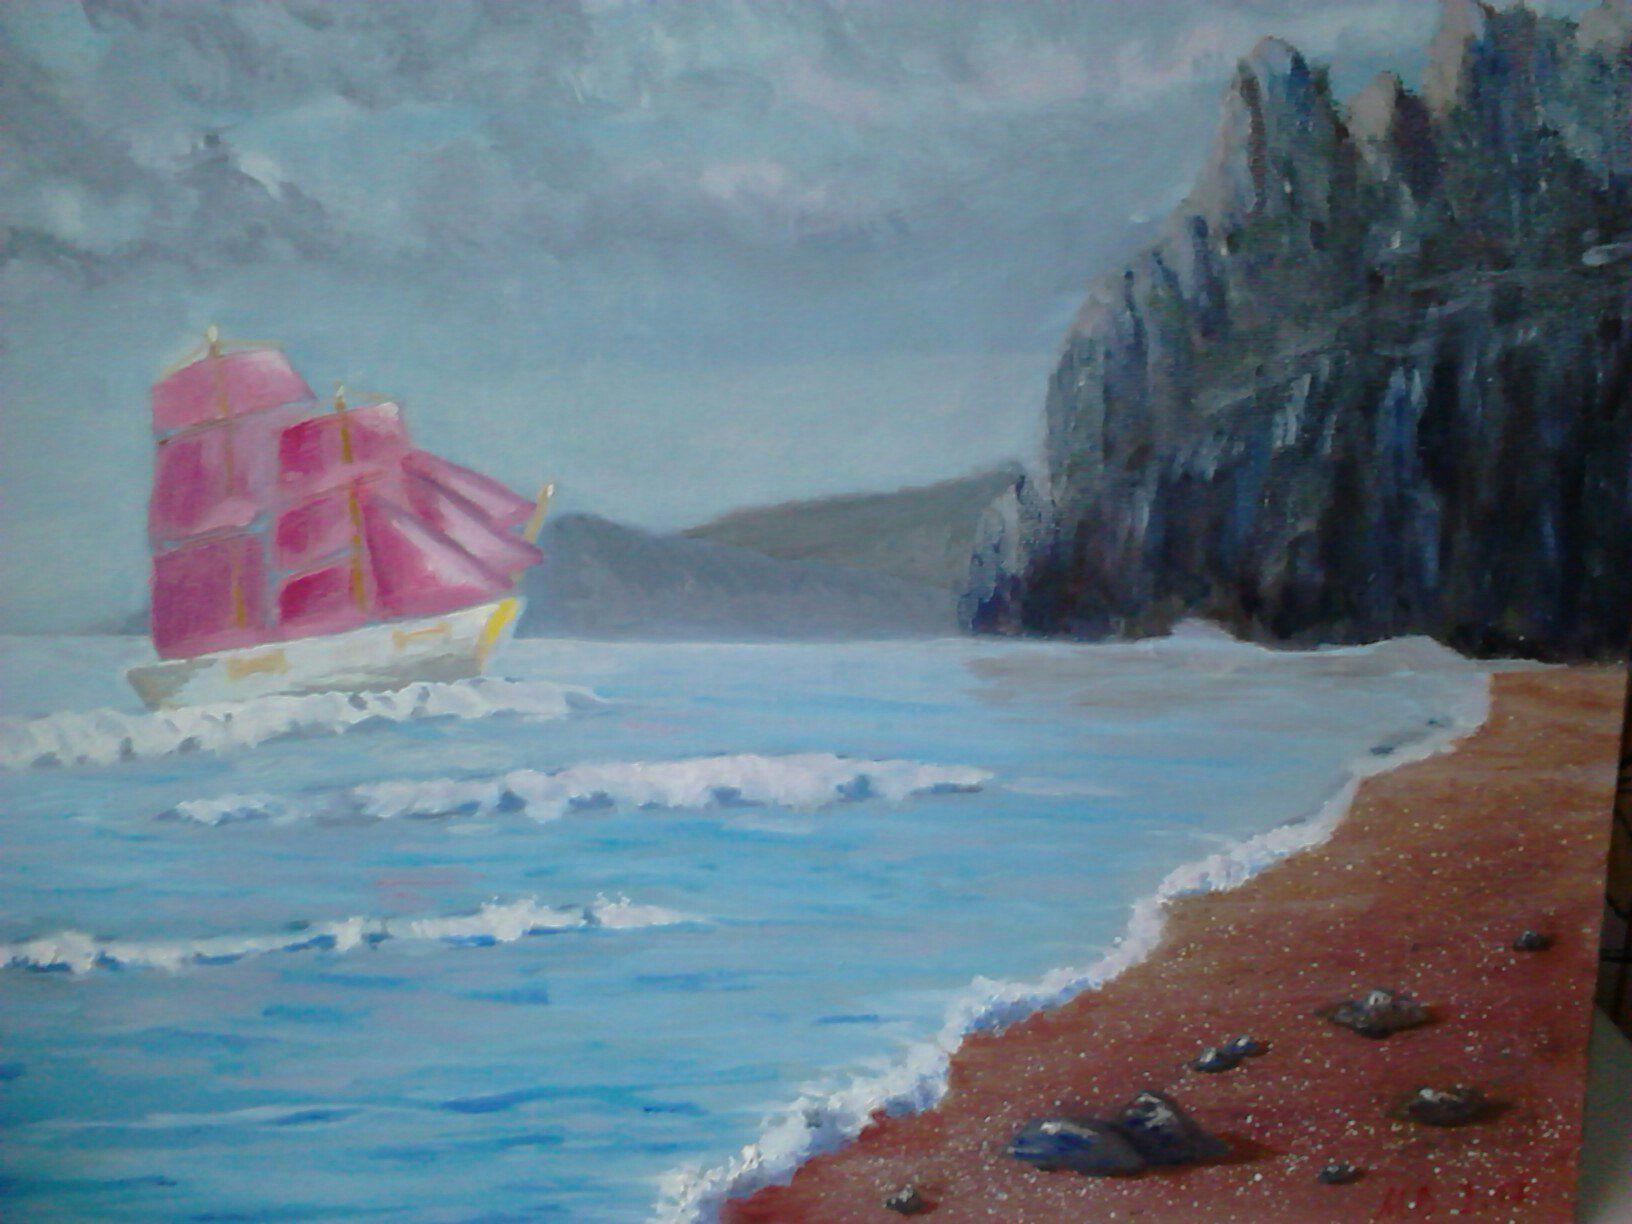 холст море картина масло берег скалы картина_маслом живопись парус